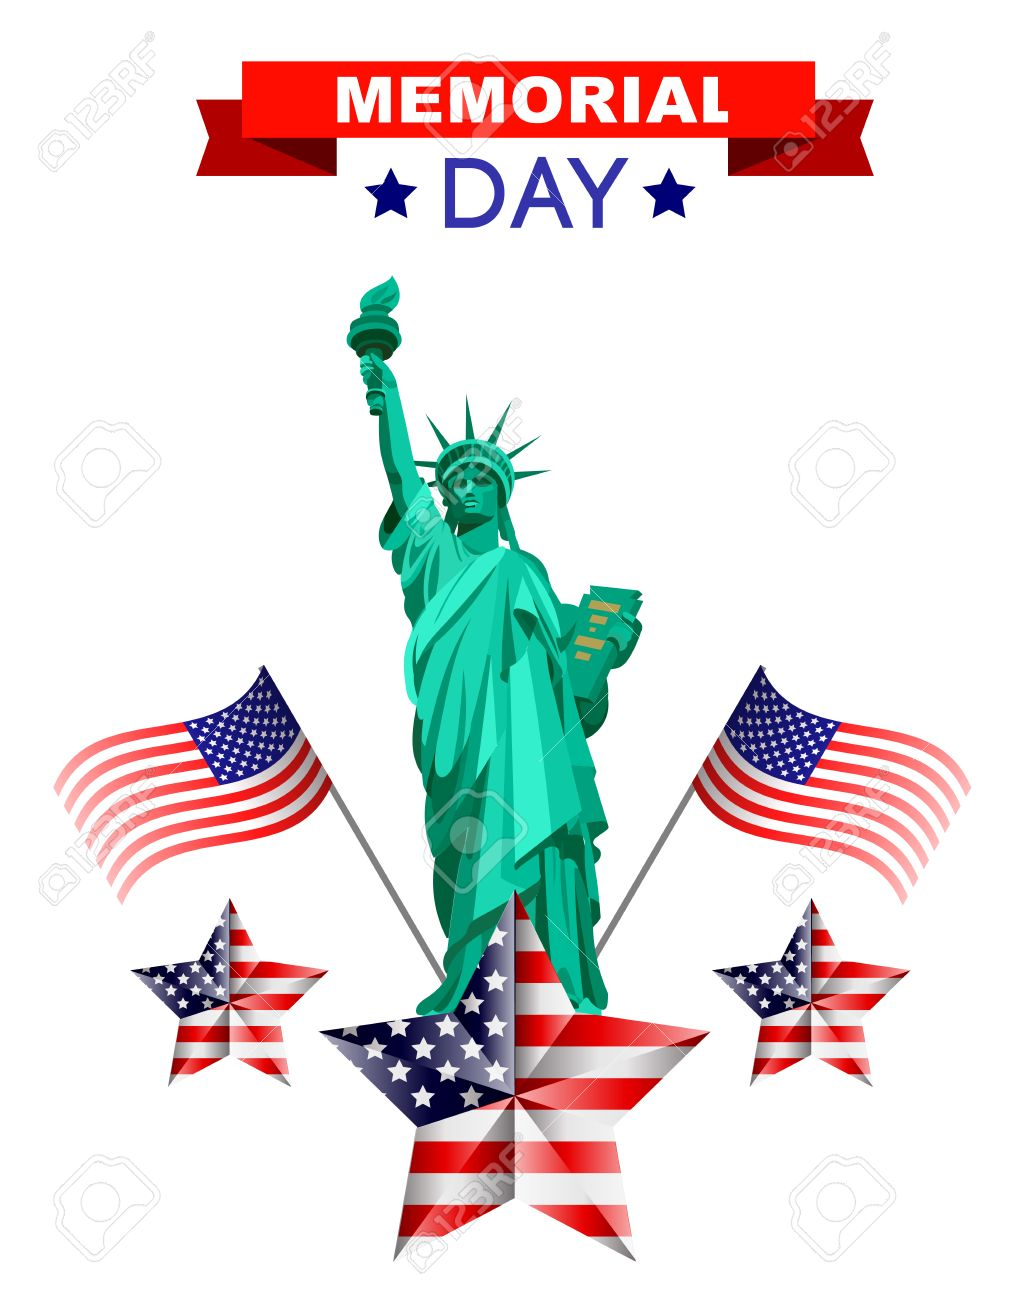 memorial day poster illustration patriotic united states of